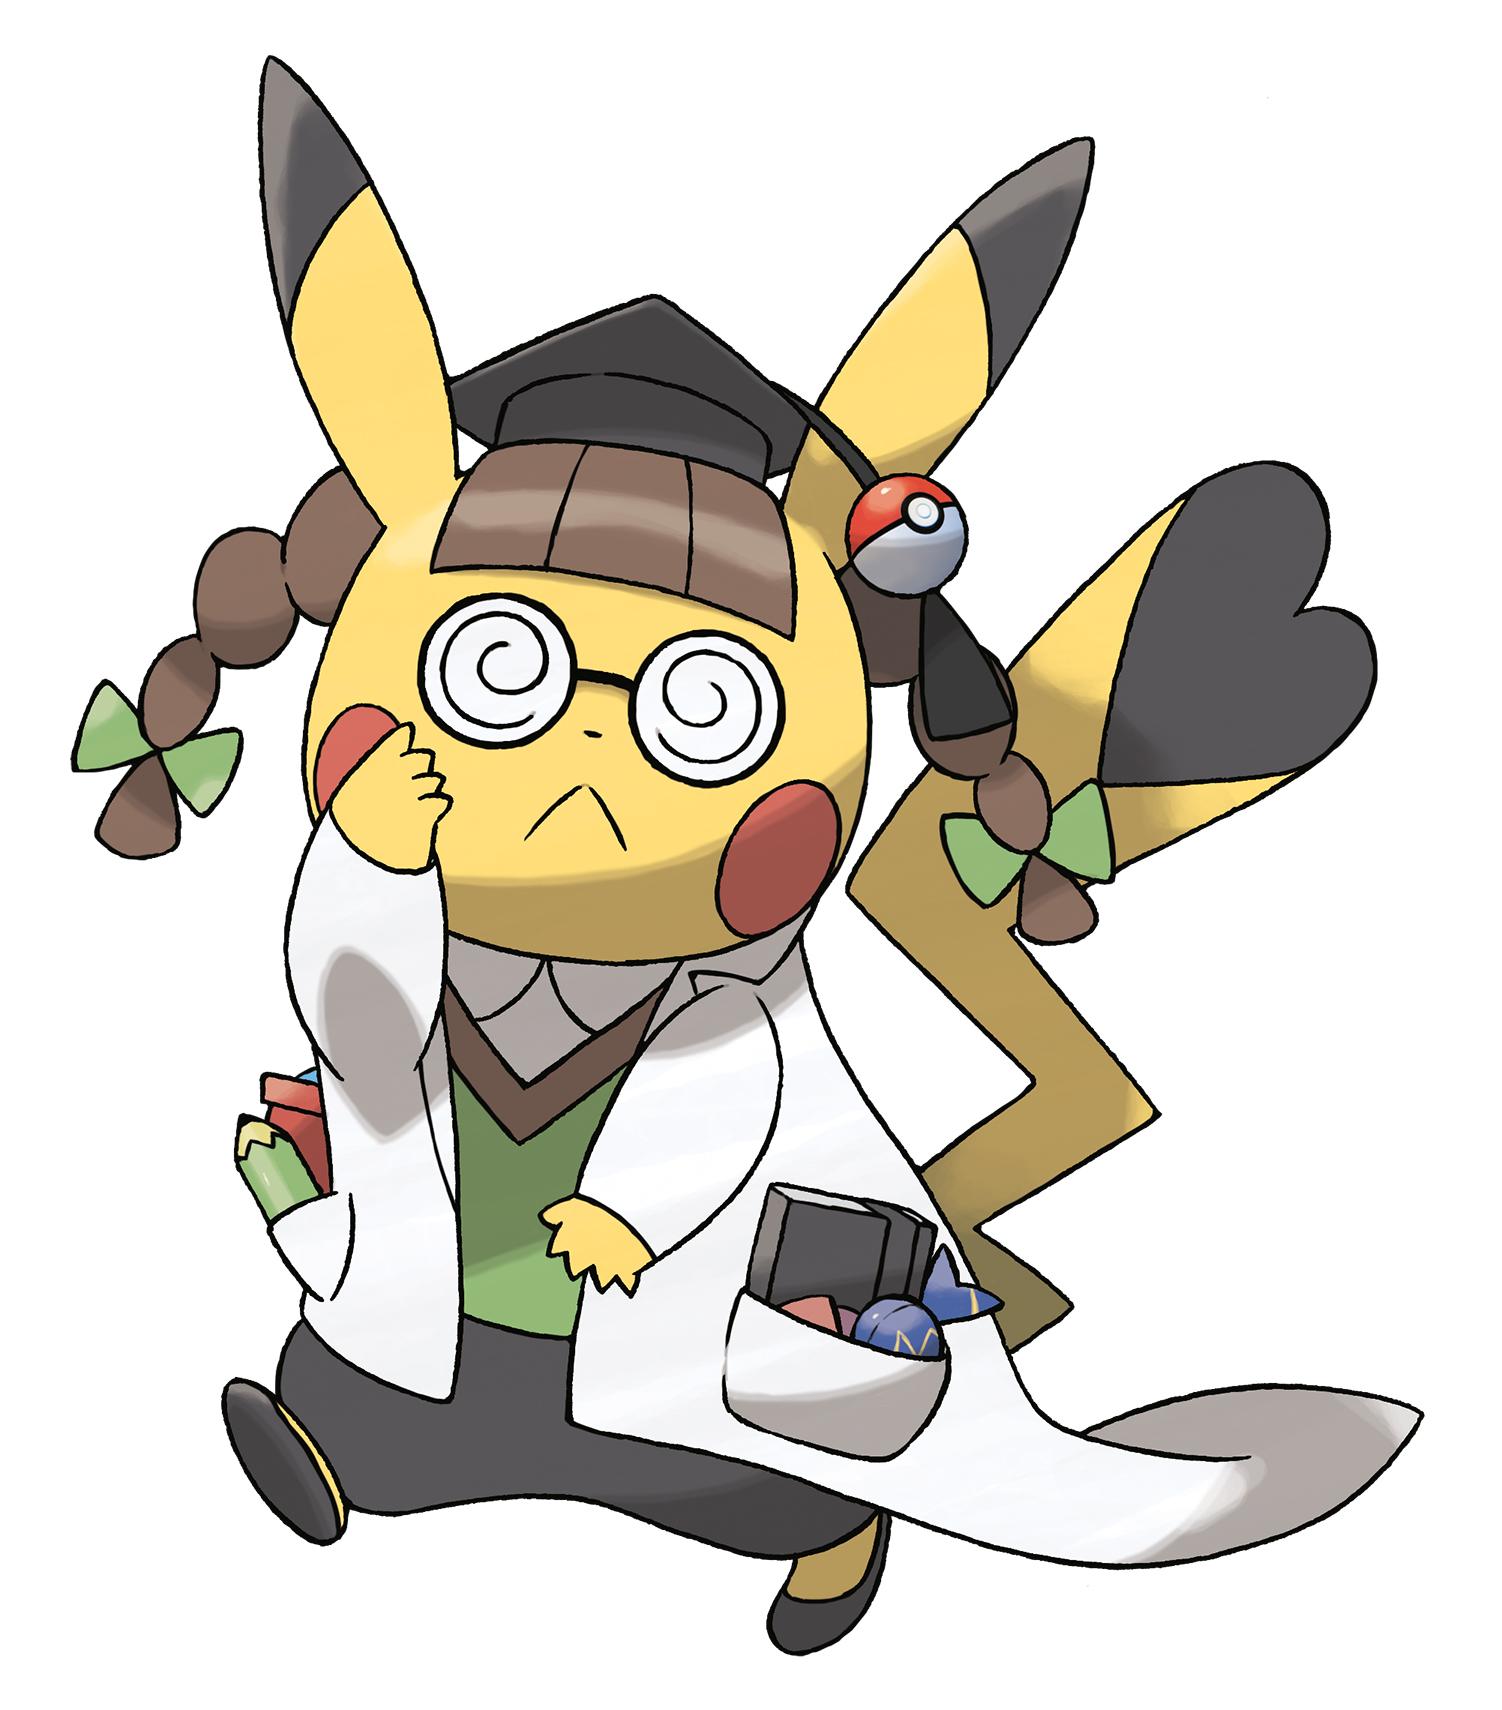 Meet Pokémon Omega Ruby/Alpha Sapphire's Cosplay Pikachu, Mega Metagross and more